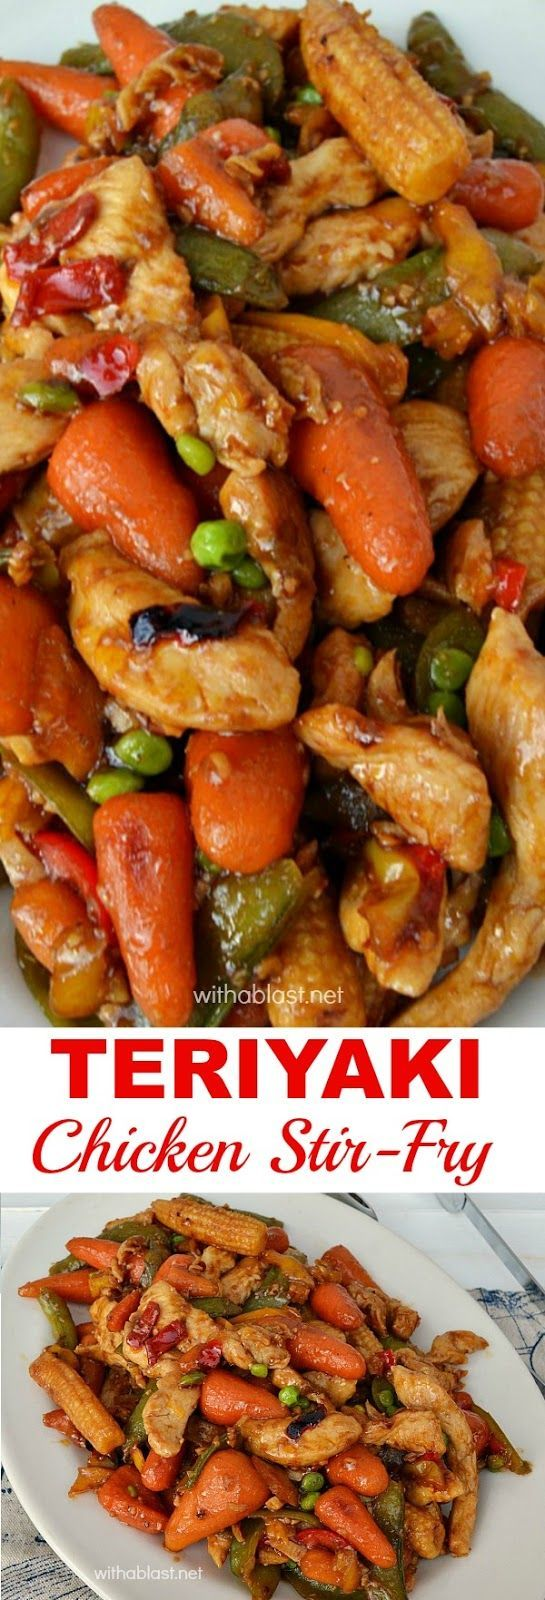 Quick easy perfect last minute dinner teriyaki chicken stir fry quick easy perfect last minute dinner teriyaki chicken stir fry chinesefoodrecipes forumfinder Gallery